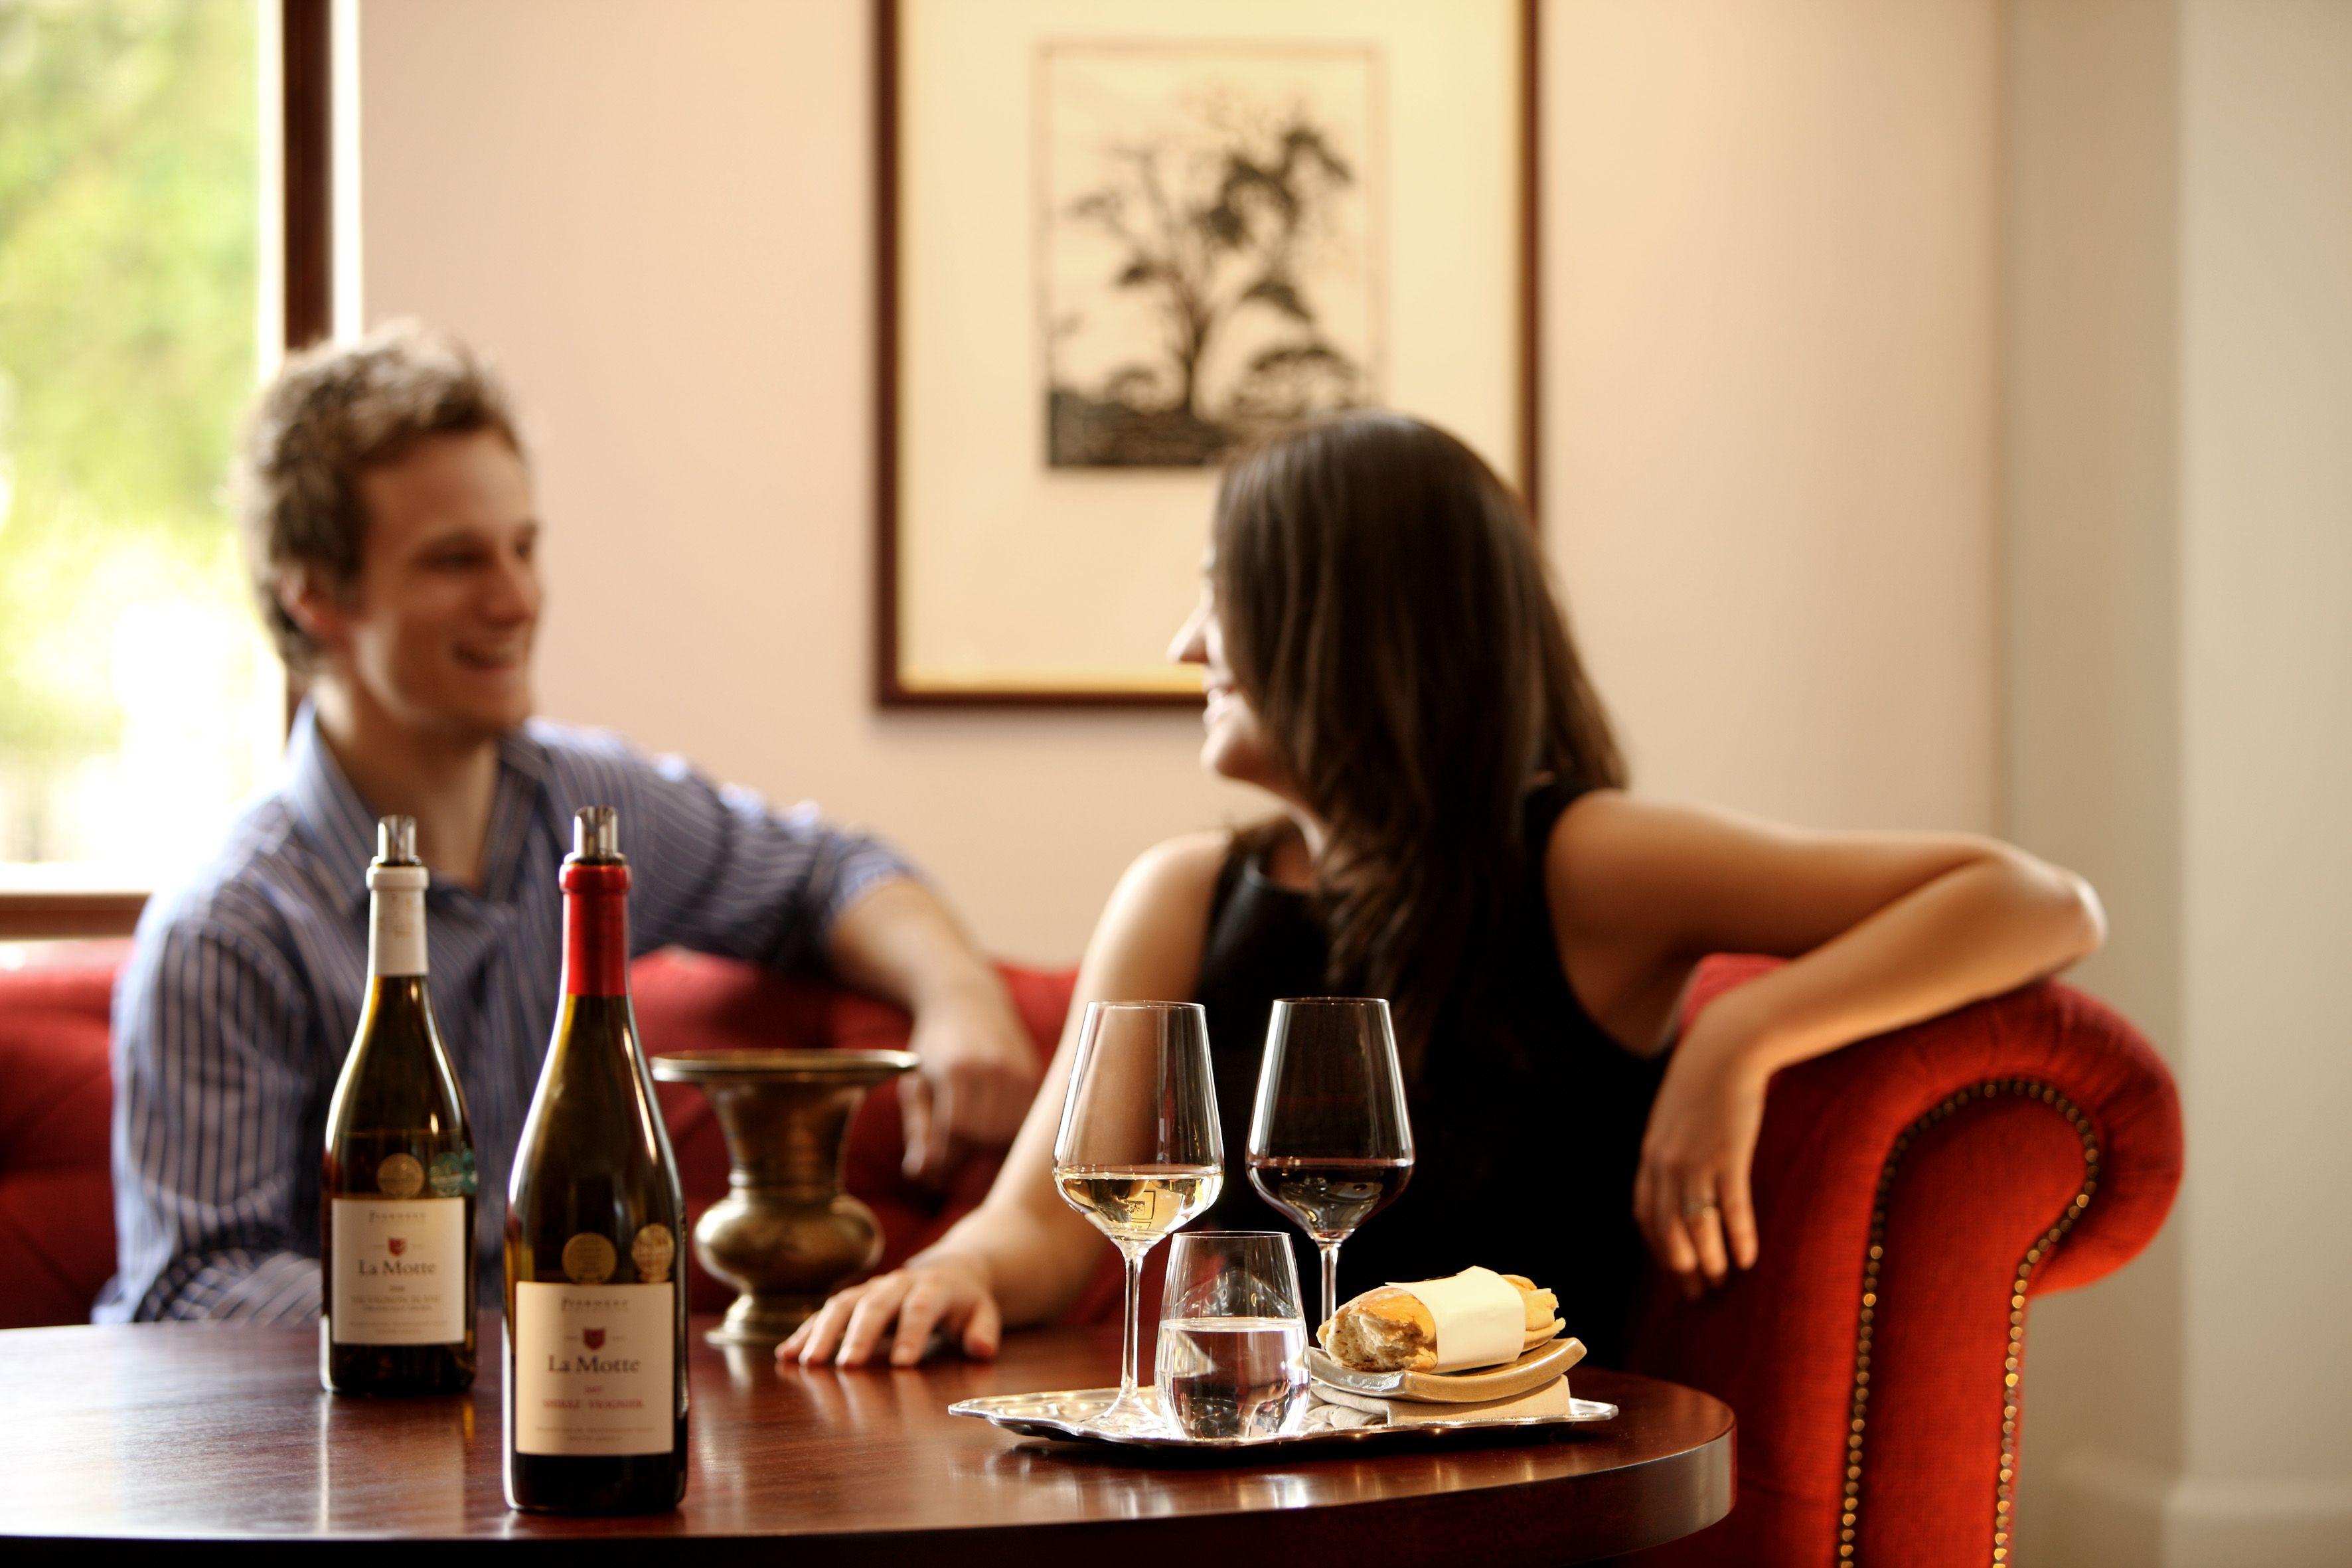 The La Motte Wine Tasting Experience Lamatte Wine Franschhoek Capetown Wine Tasting Wine Enthusiast Magazine Wine Tasting Experience